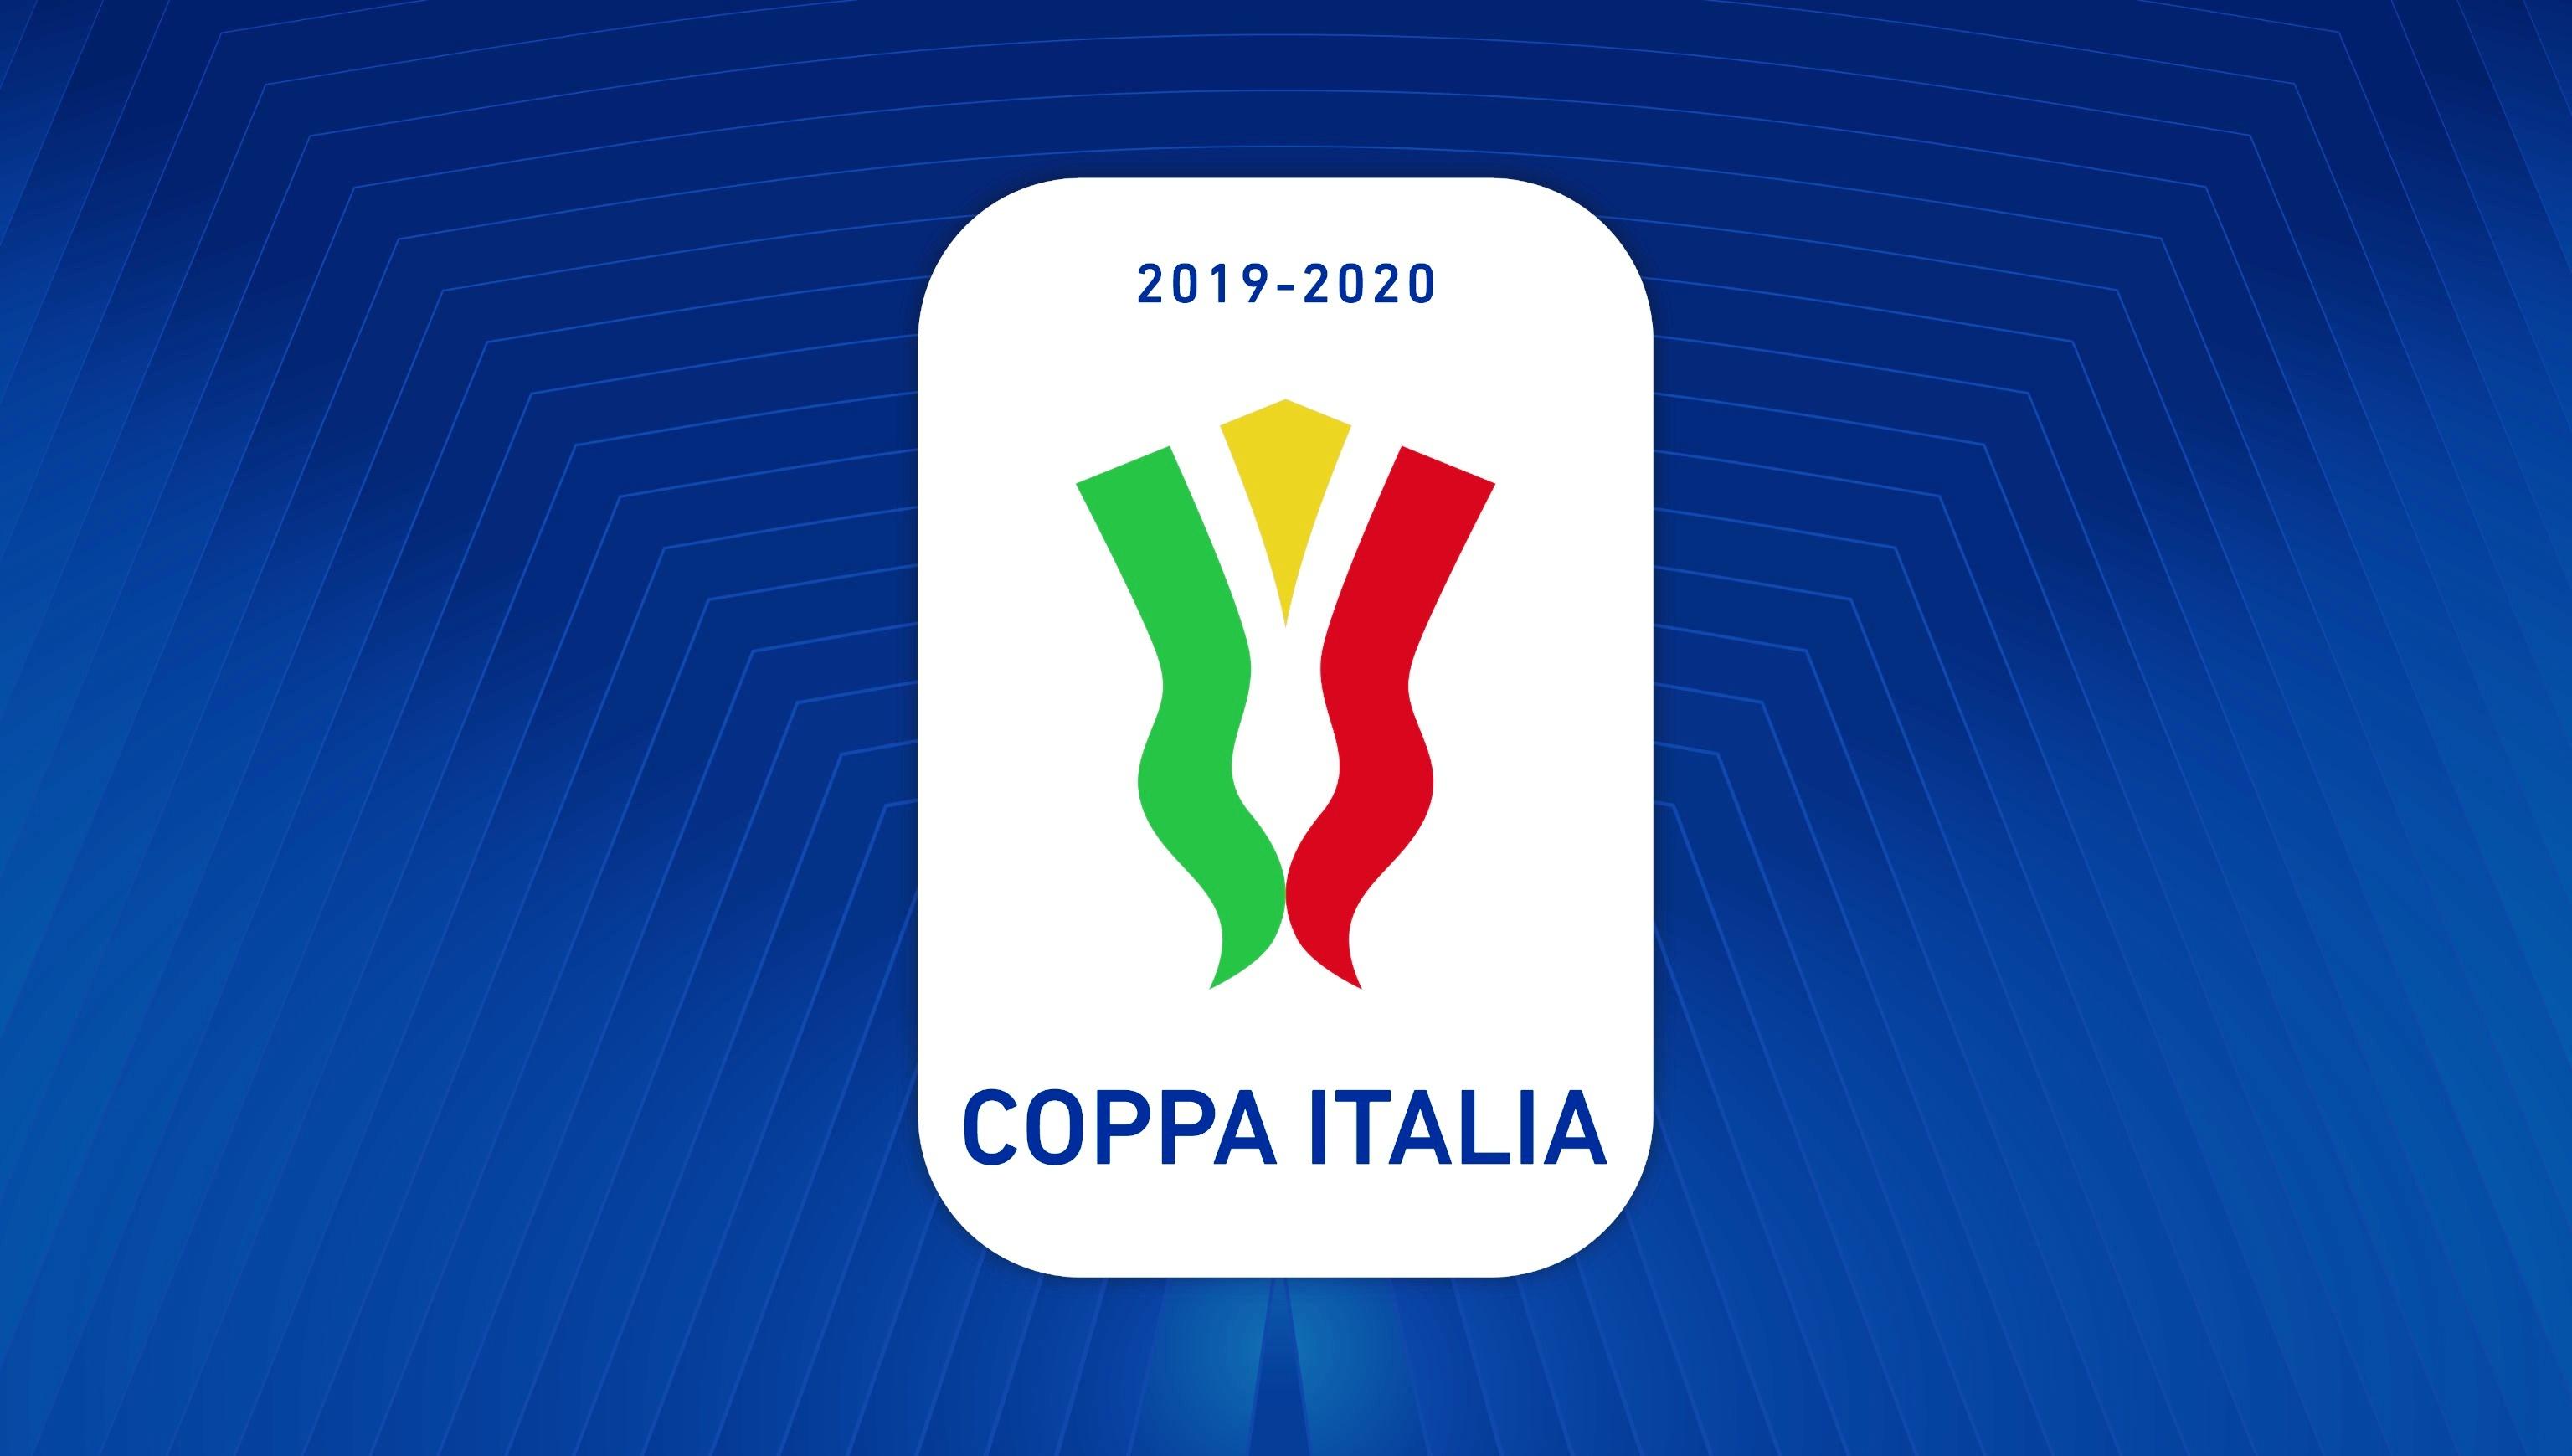 Pronostico Milan-spal, schedina Coppa Italia 15 gennaio 2020